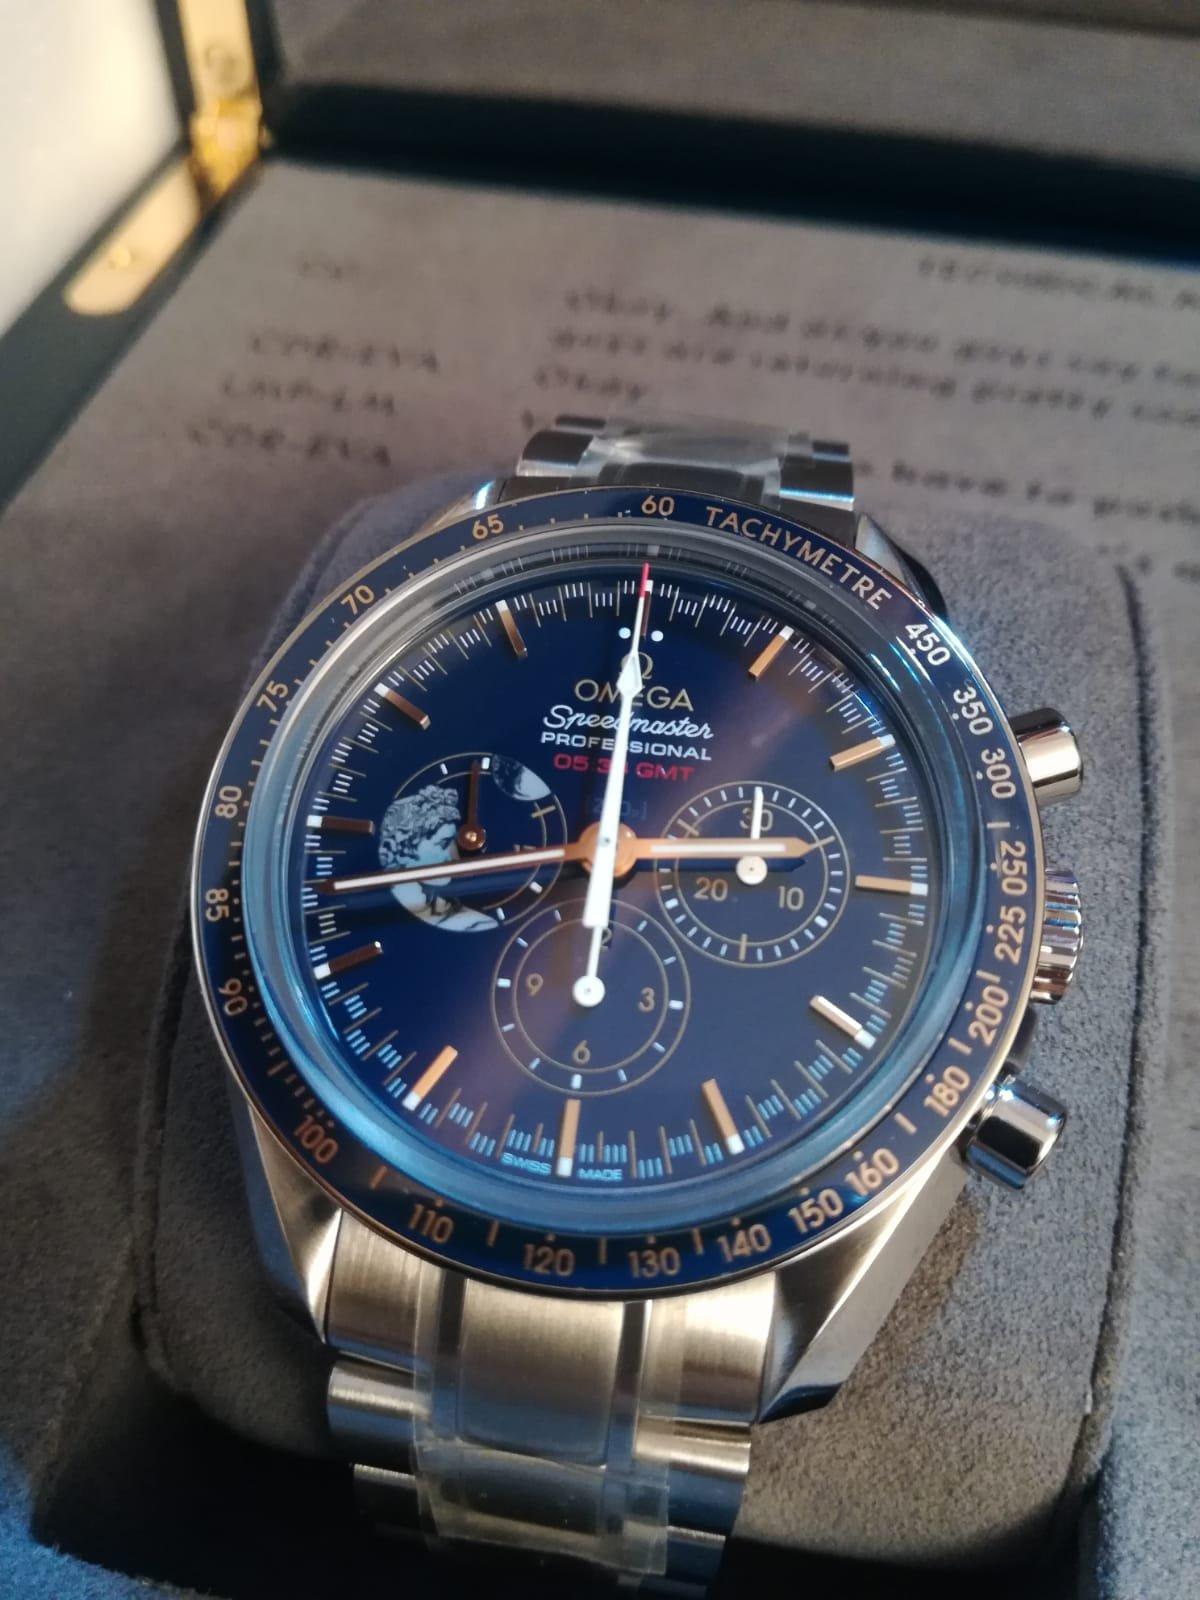 Omega Speedmaster Professional Moonwatch Stainless Steel   Blue   Bracelet    Apollo XVII 45th Anniversary. 1 799 000 Ft. Eladó 2d8fd02bd3